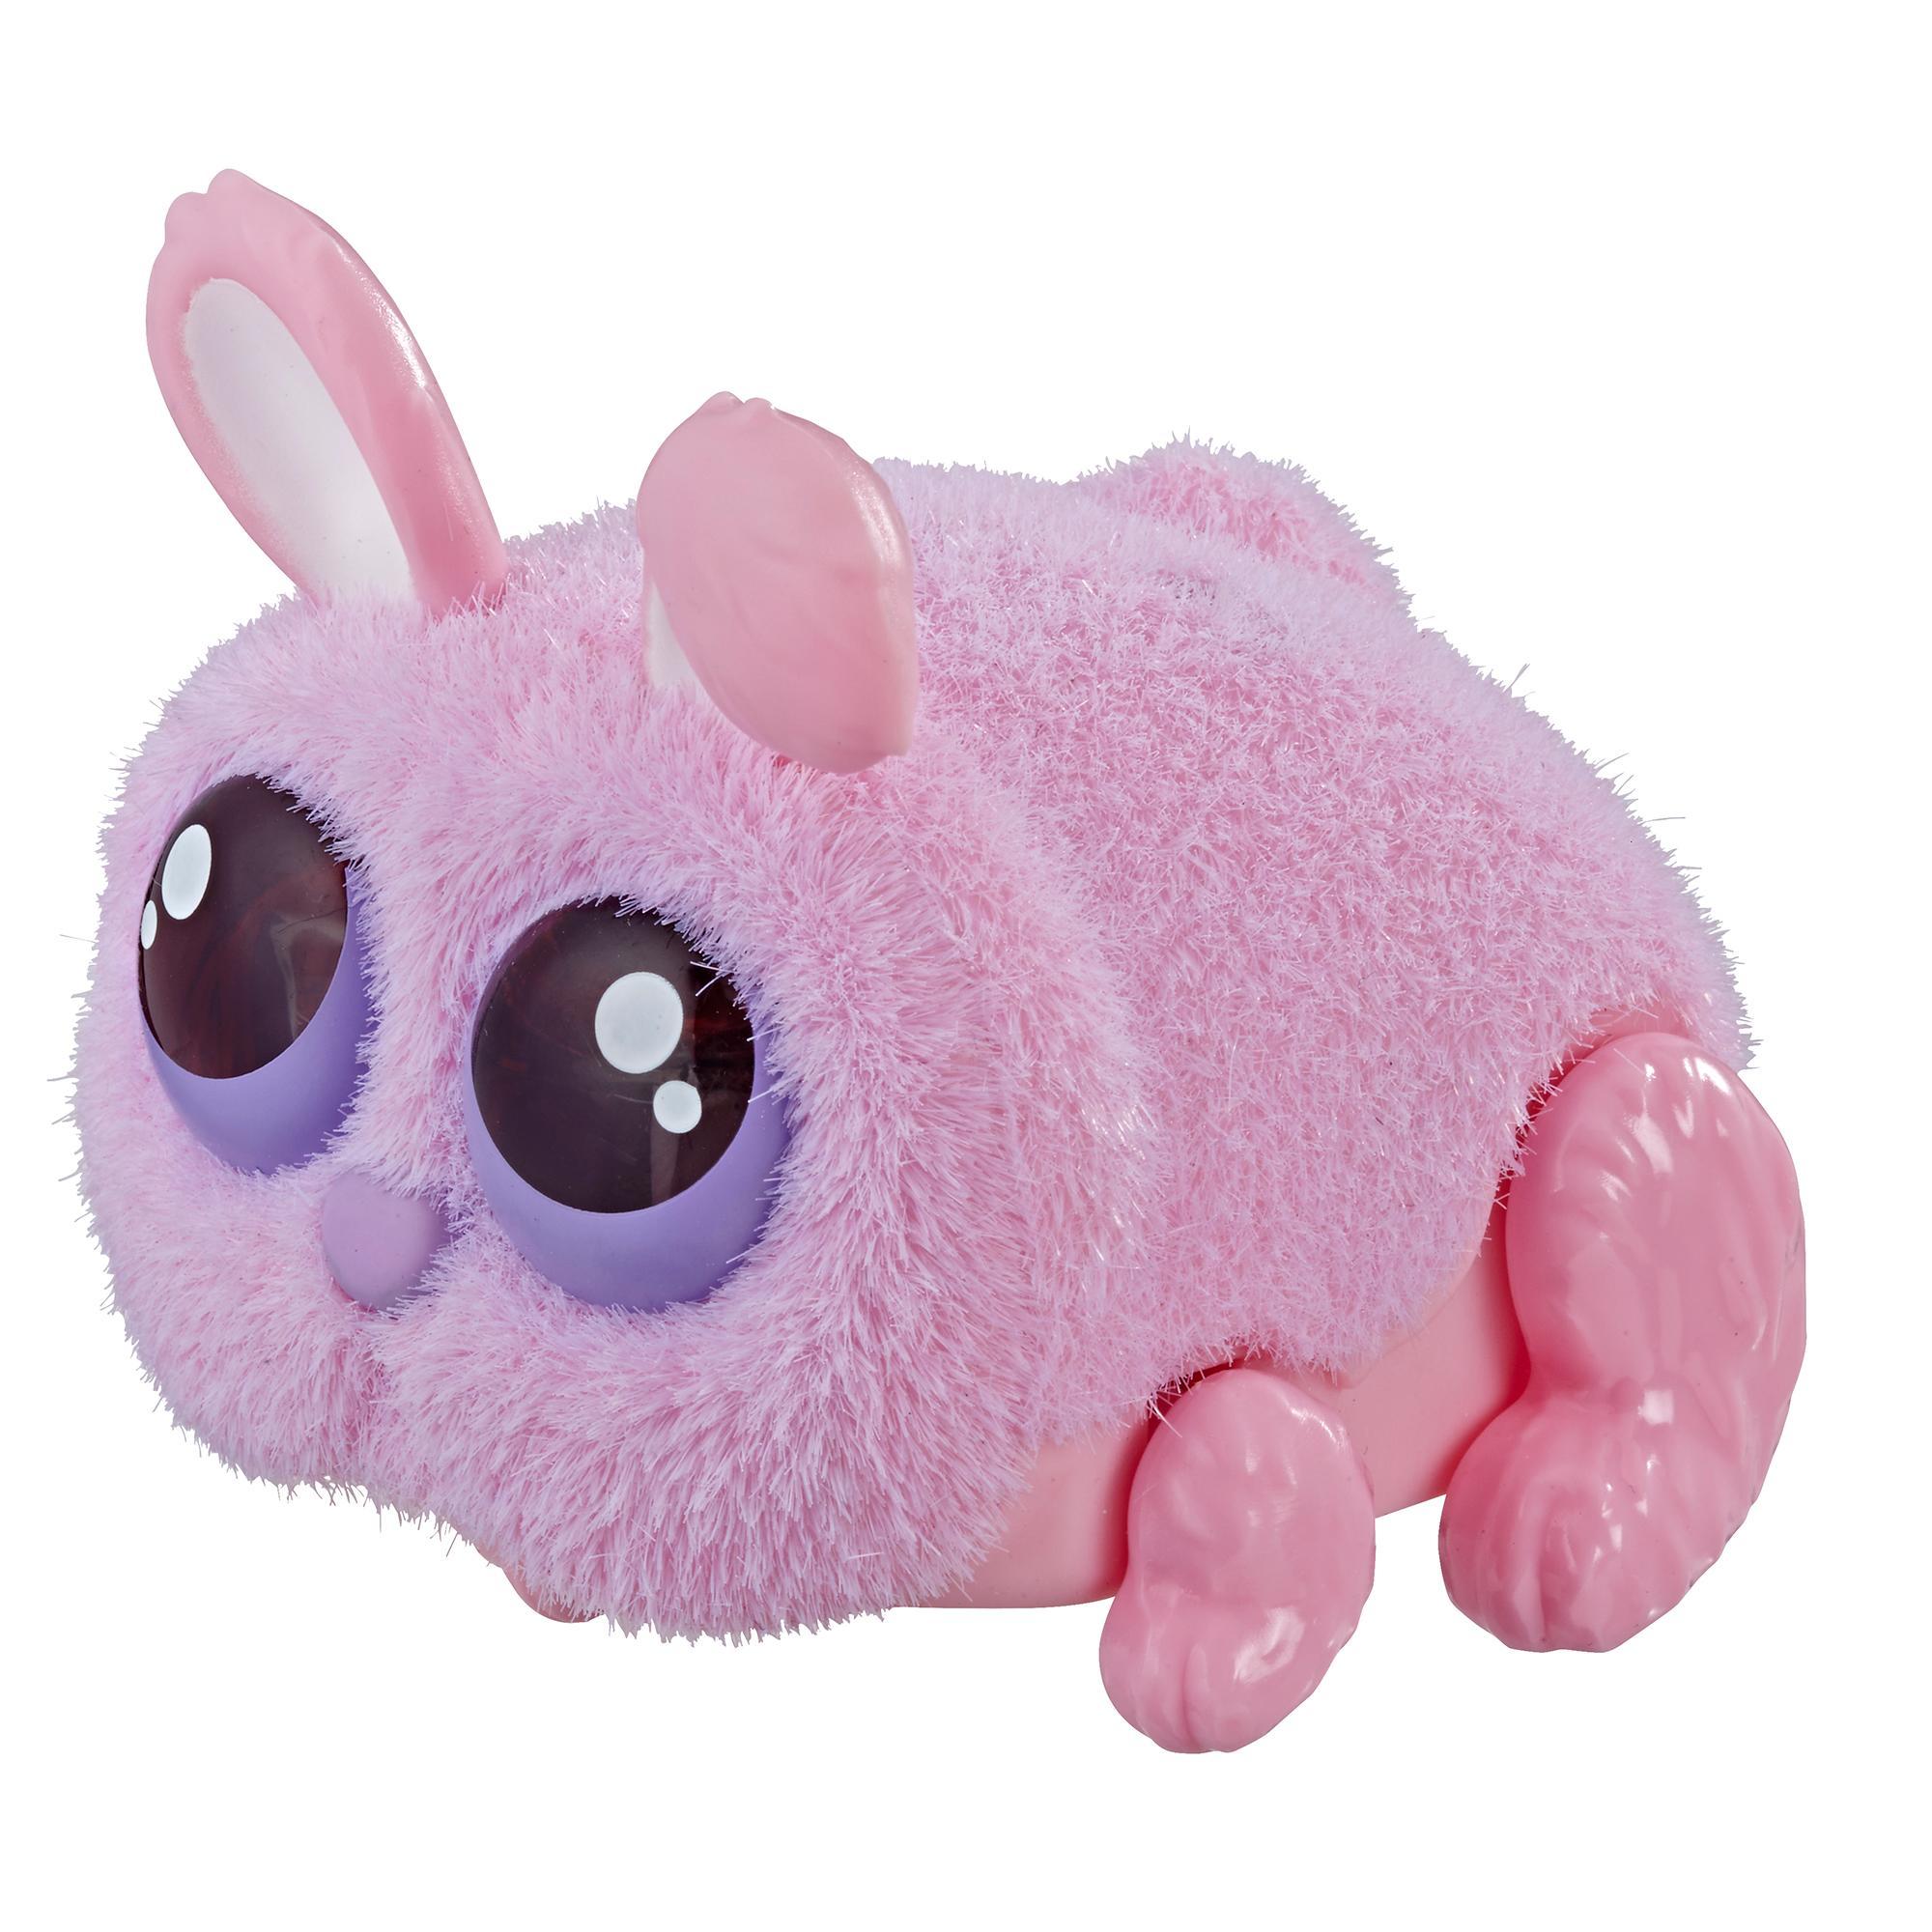 Yellies! Biscuit Bun Voice-Activated Bunny Pet Toy